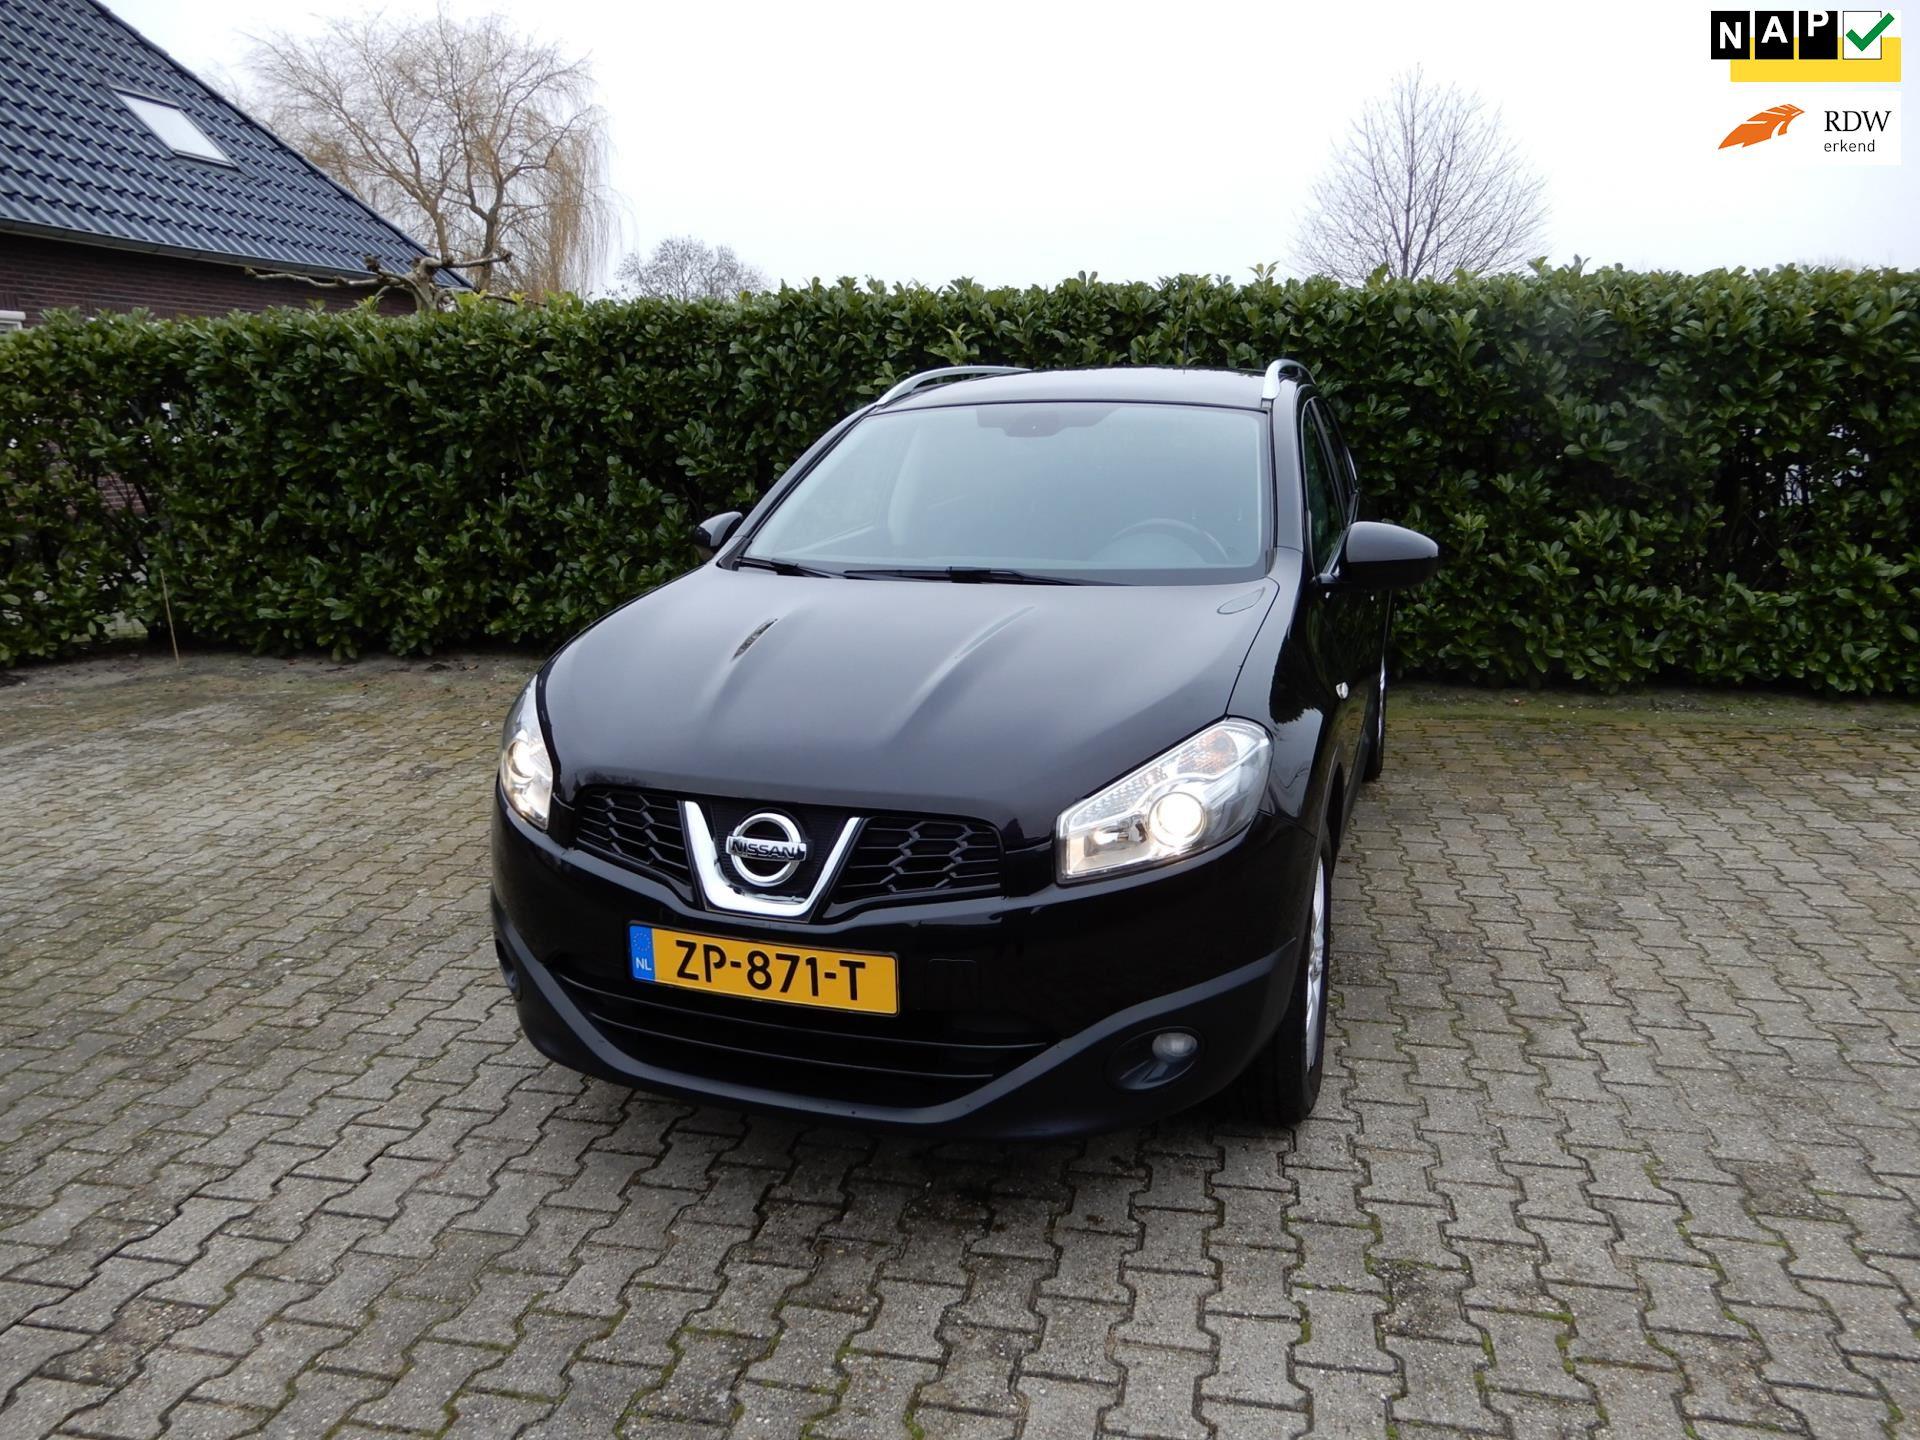 Nissan Qashqai 2 occasion - Autobedrijf Nieuwbroek